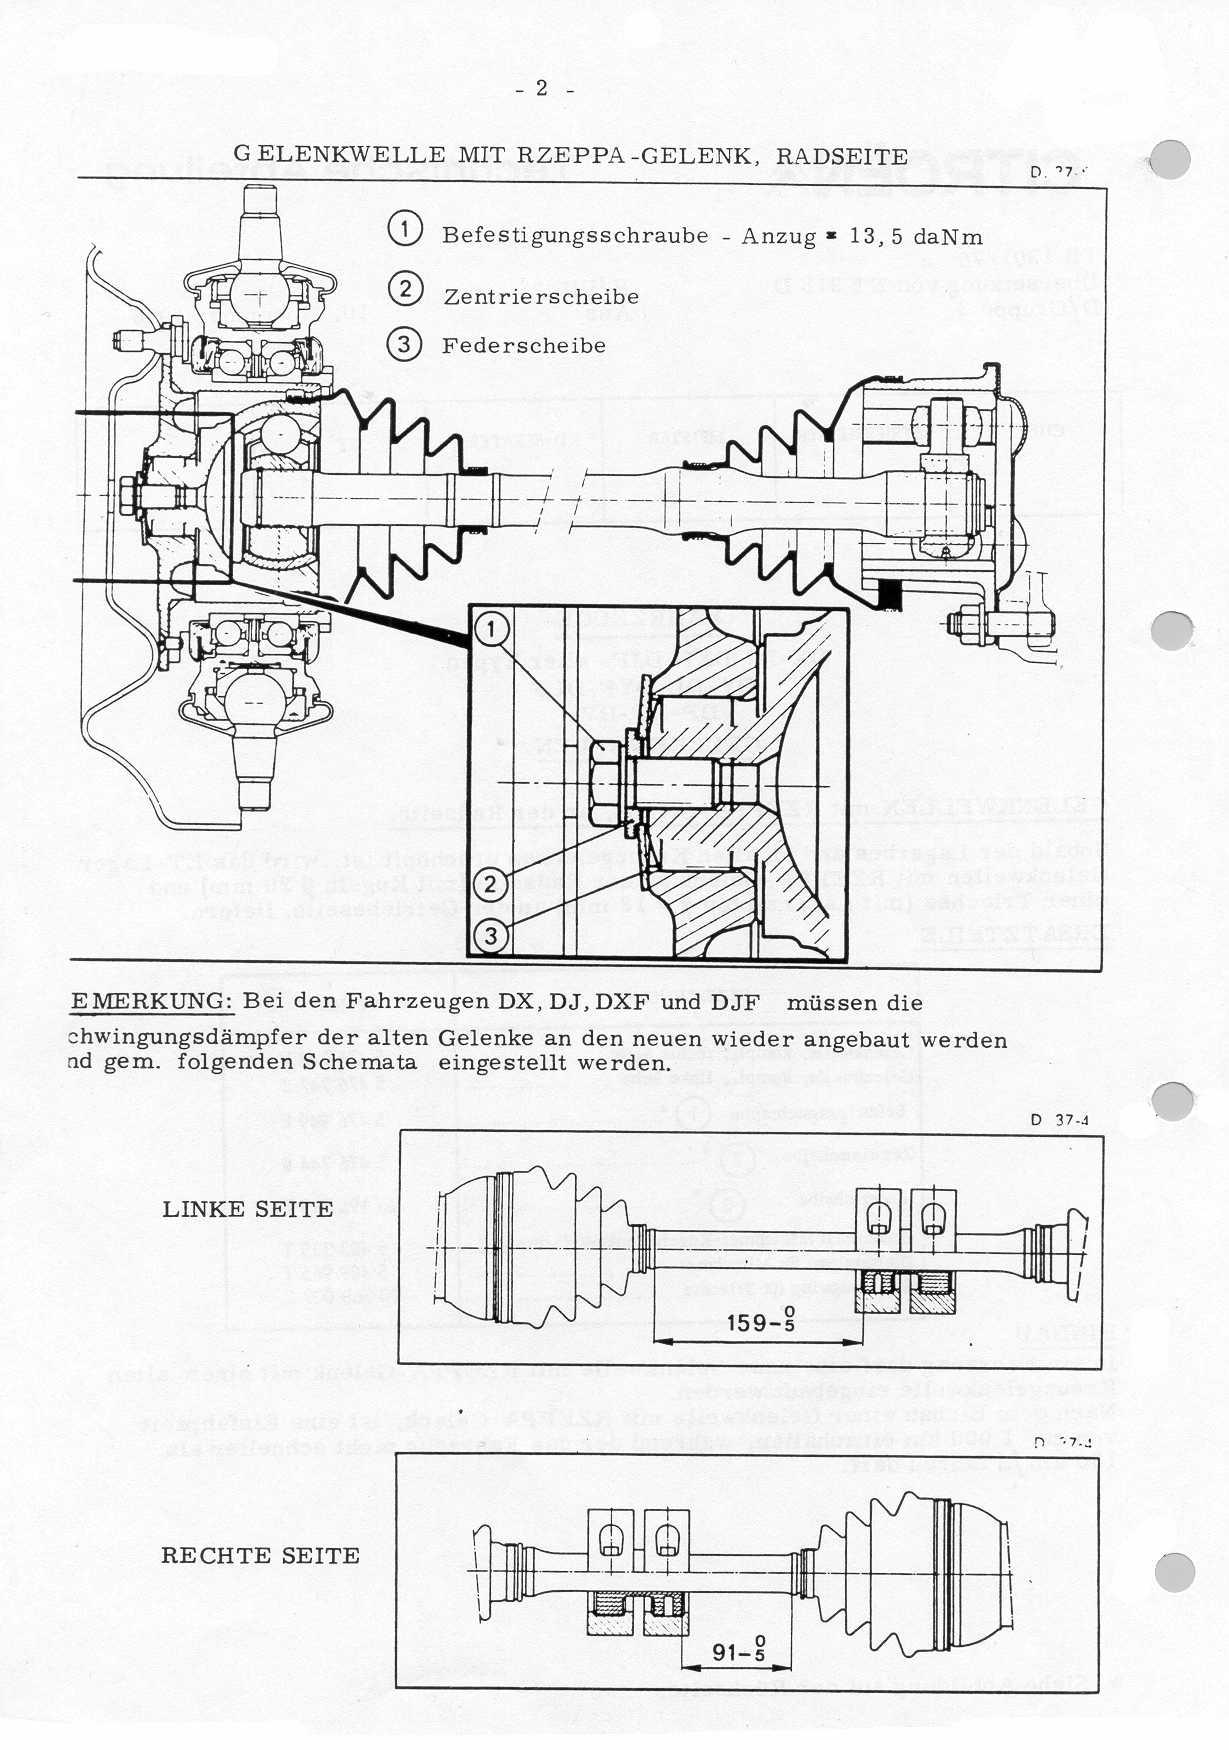 DS Rzeppa drive shaft